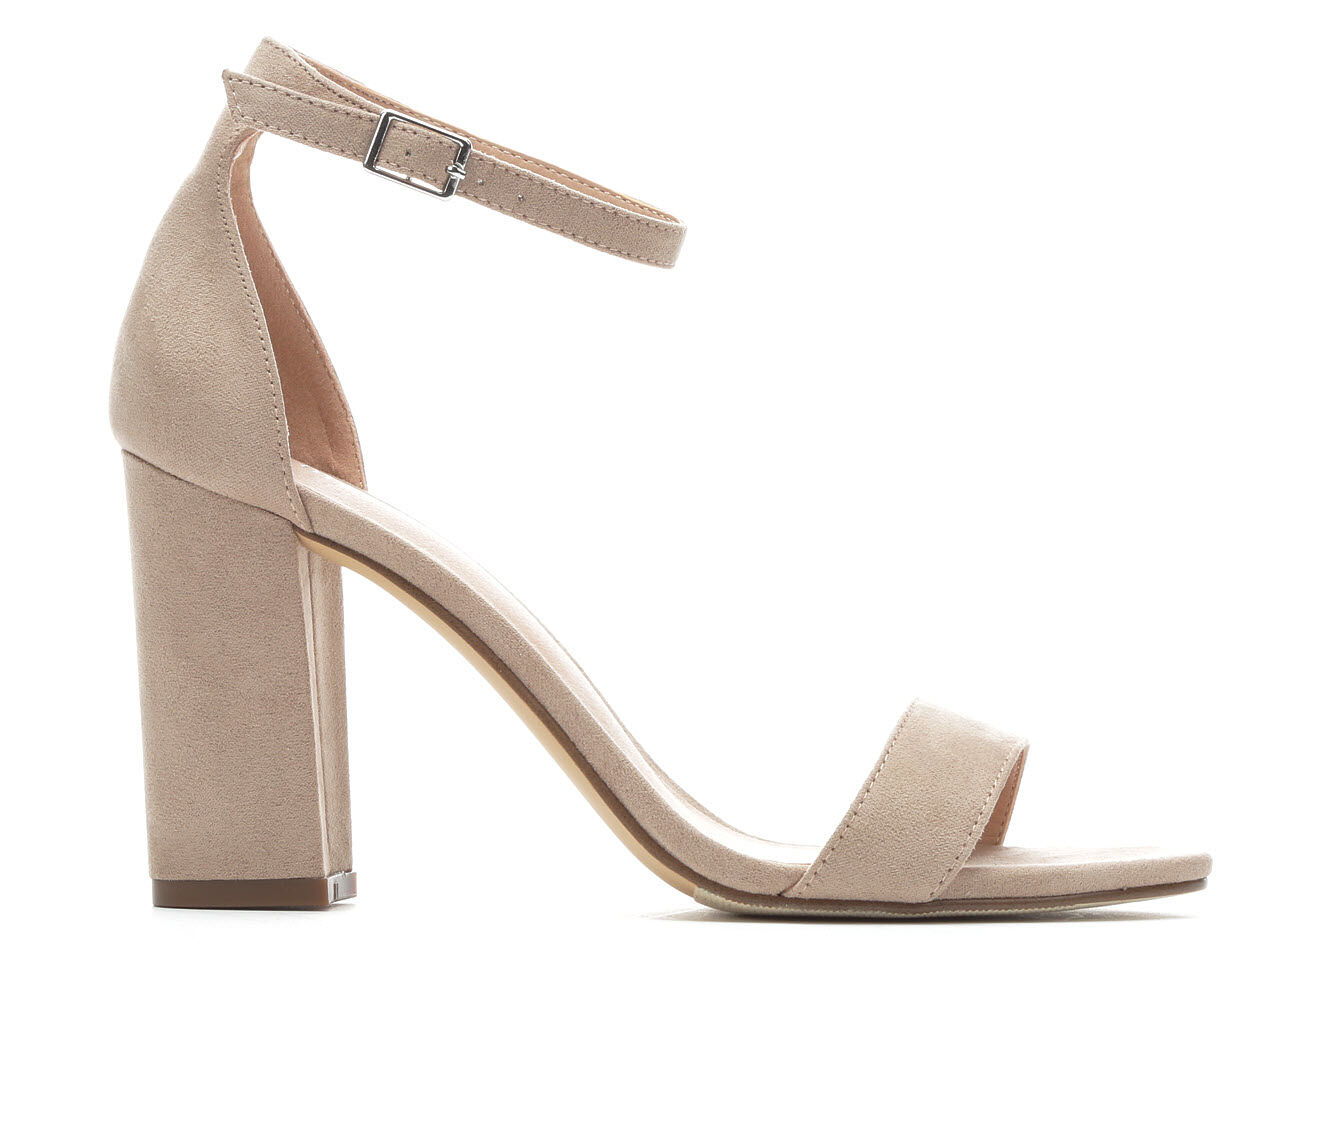 offer original Women's Madden Girl Beella Heeled Sandals Blush Micro